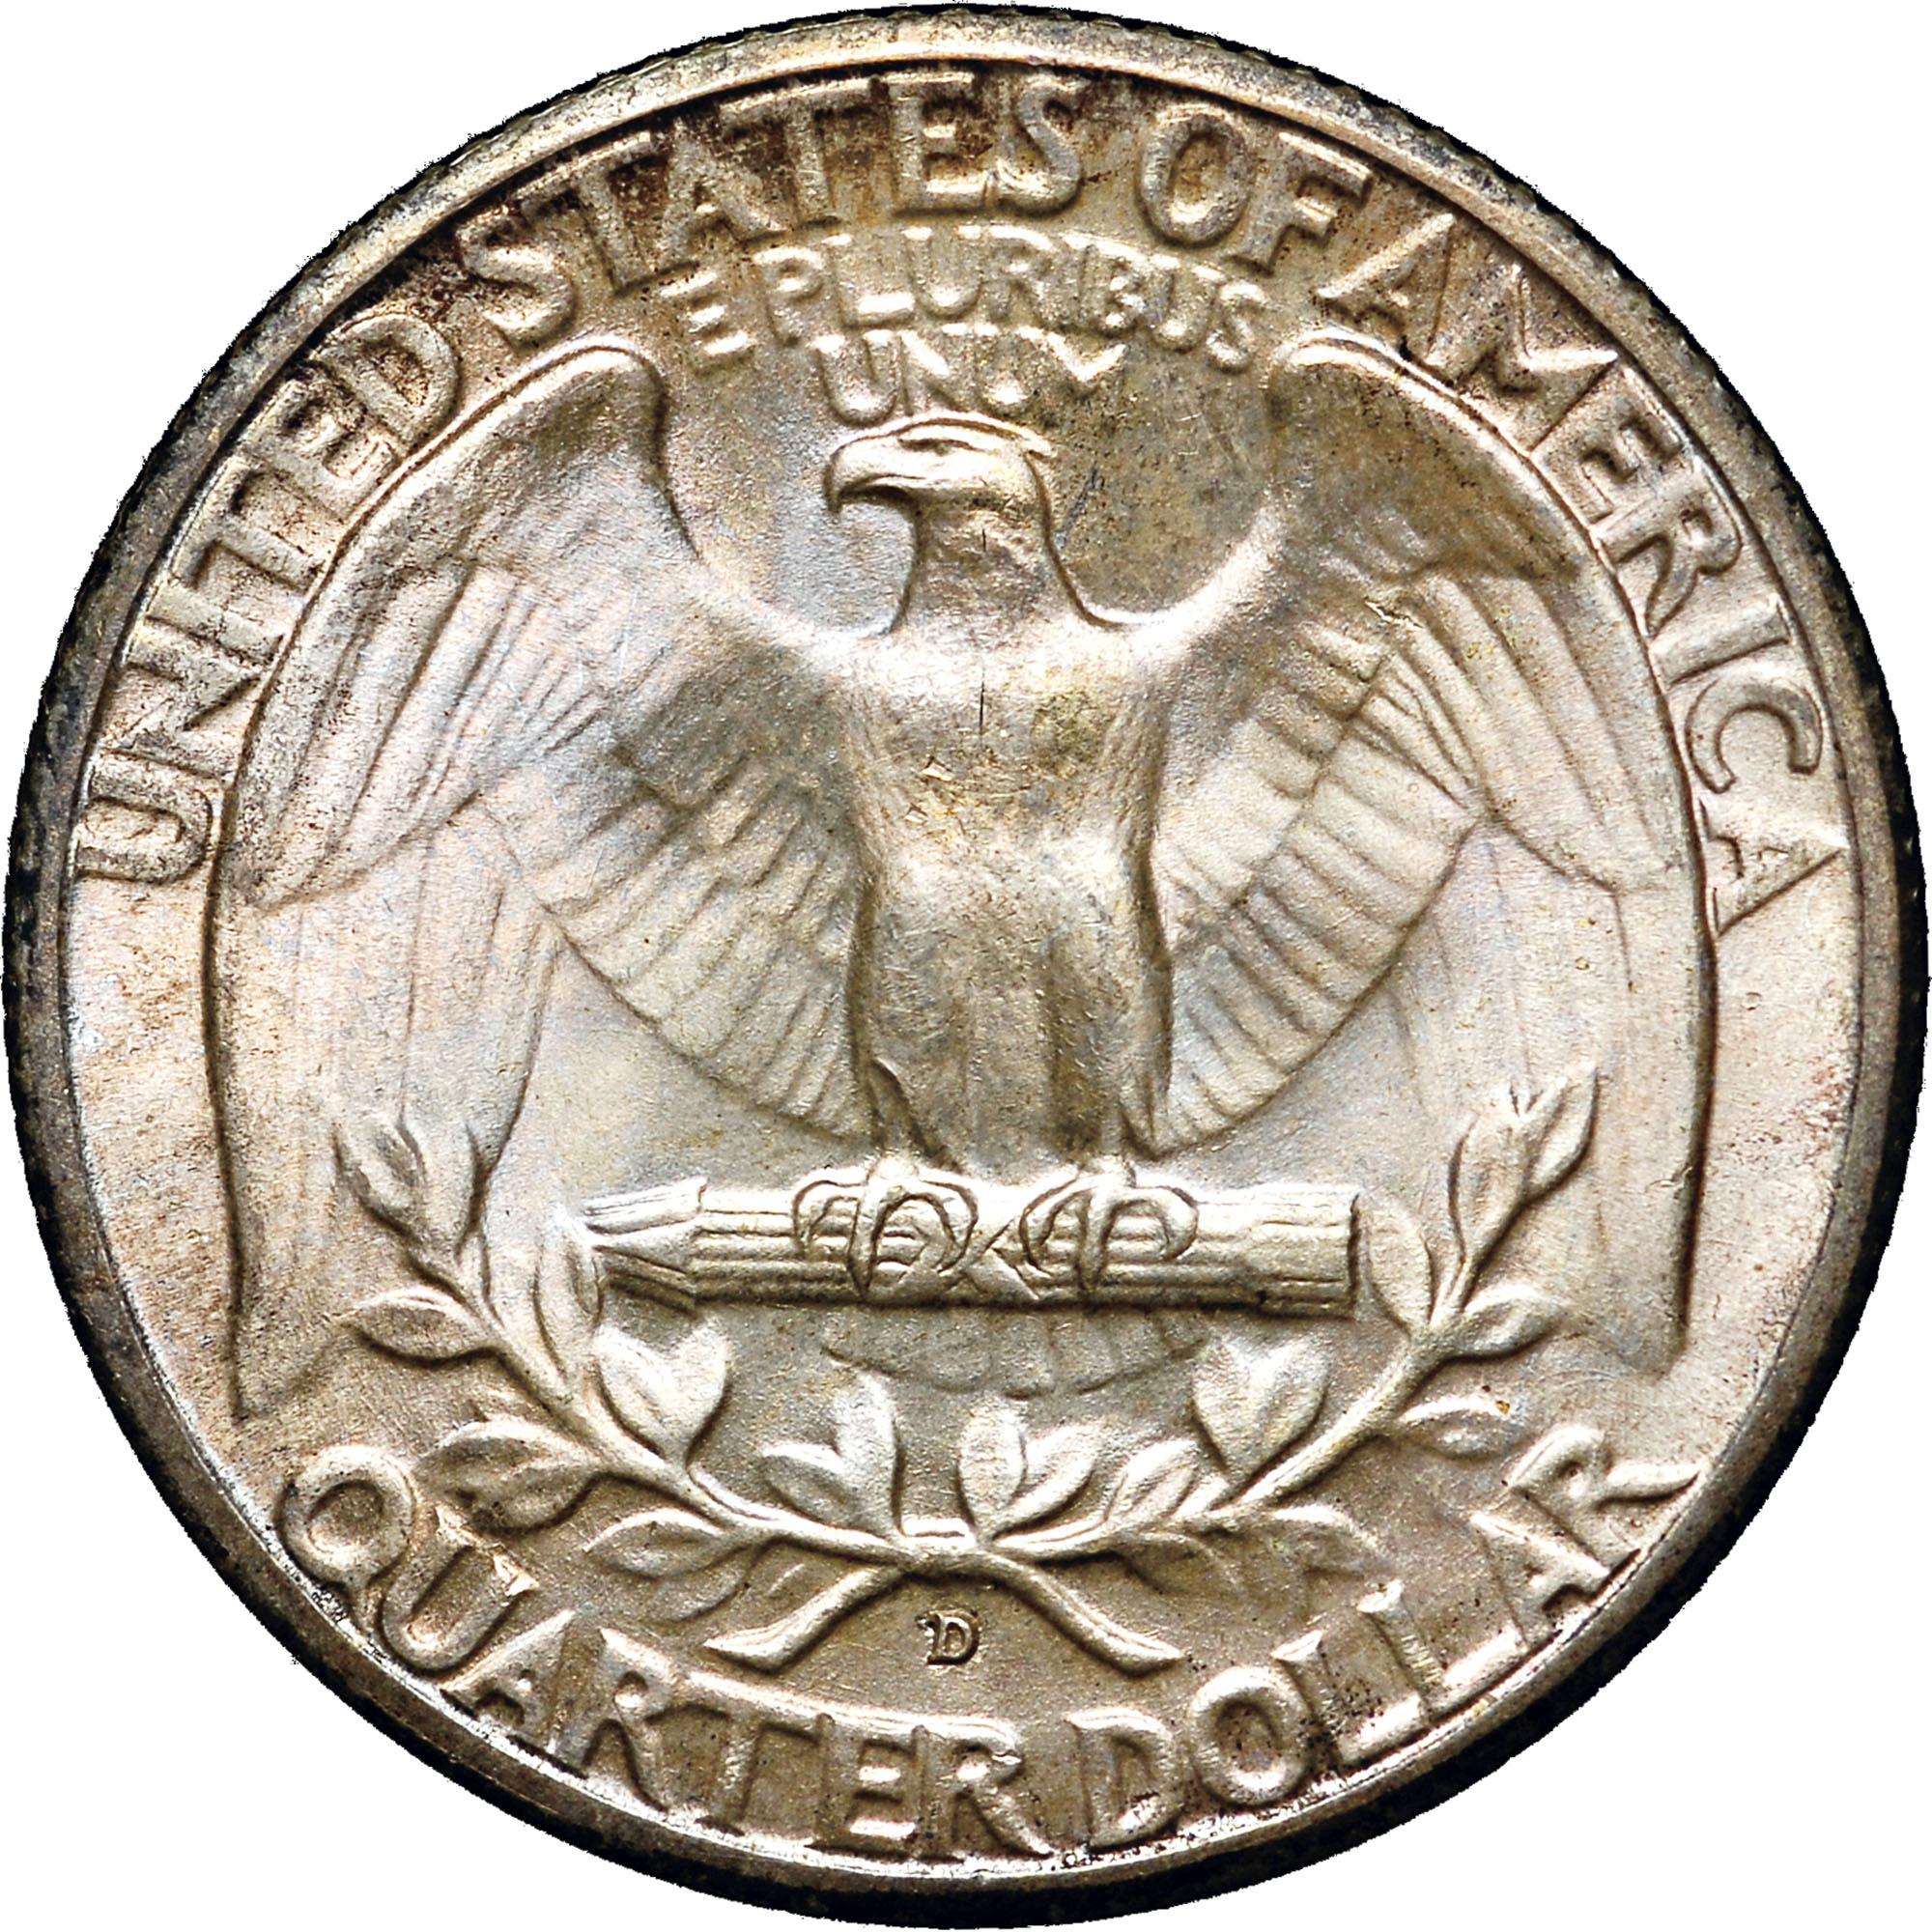 1937 D 25c Washington Silver Quarter US Coin Average Circulated